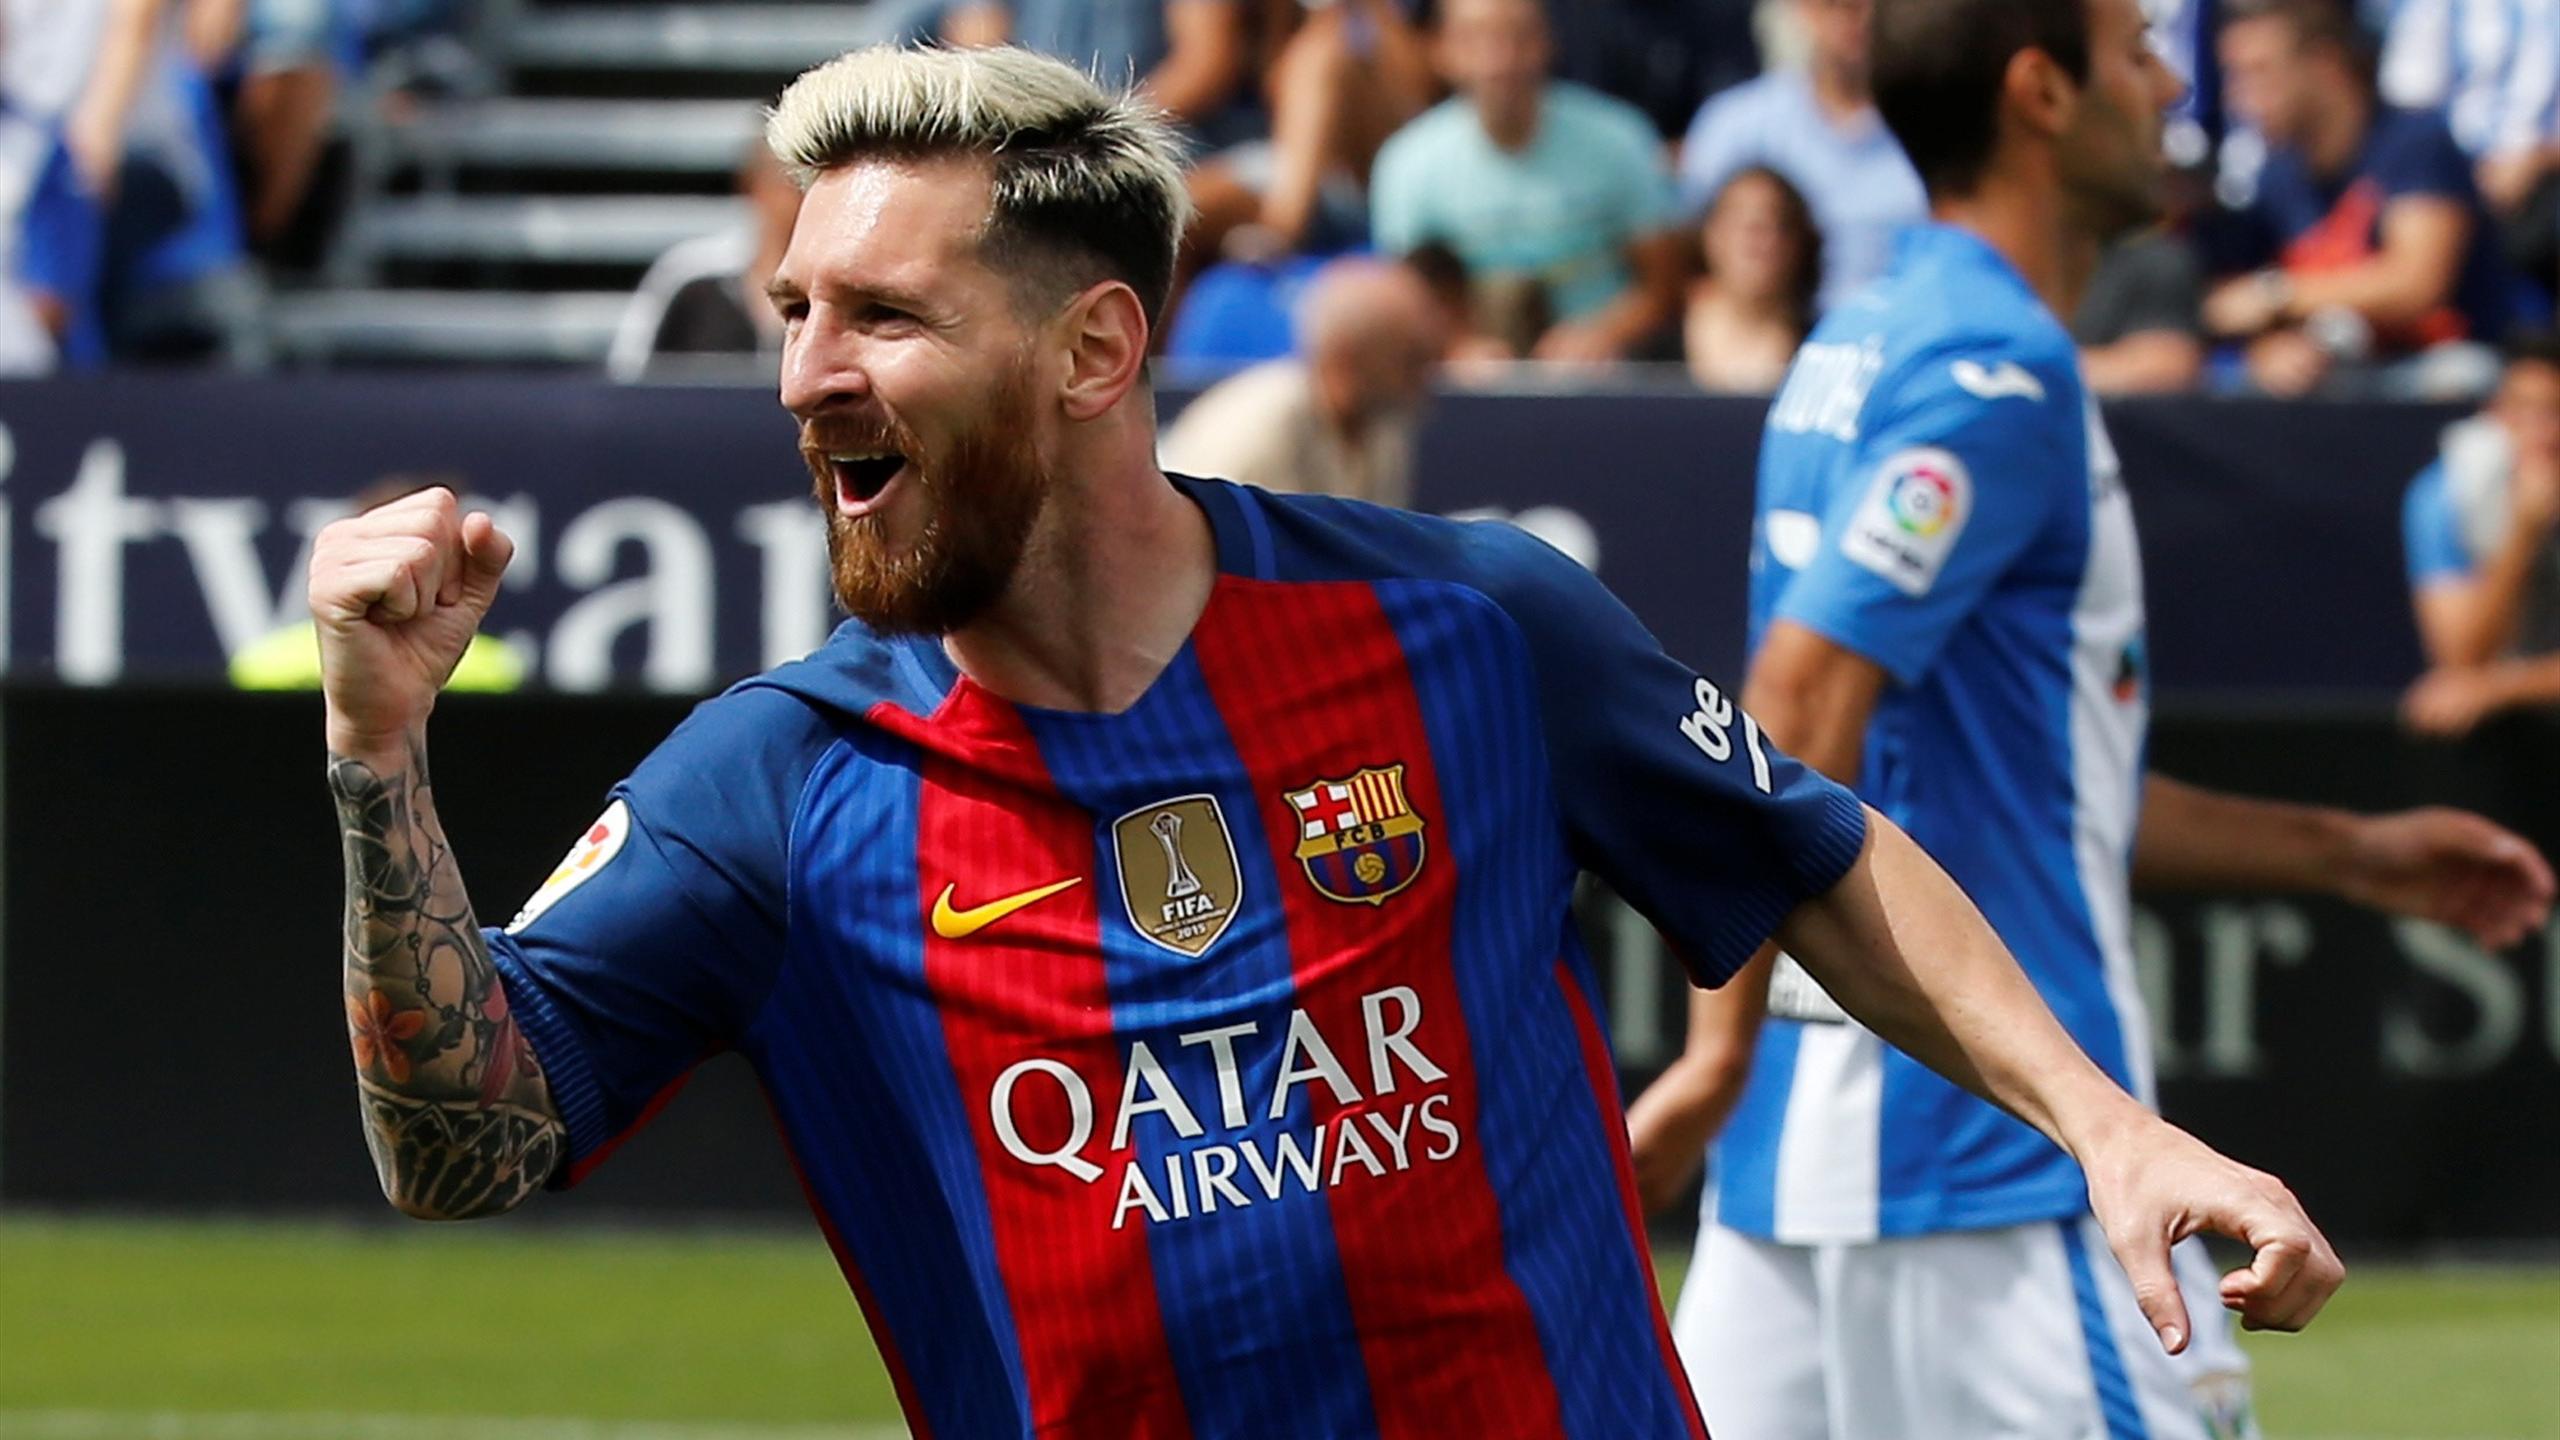 Barcelona's Lionel Messi cerebrates scoring a goal against Leganes